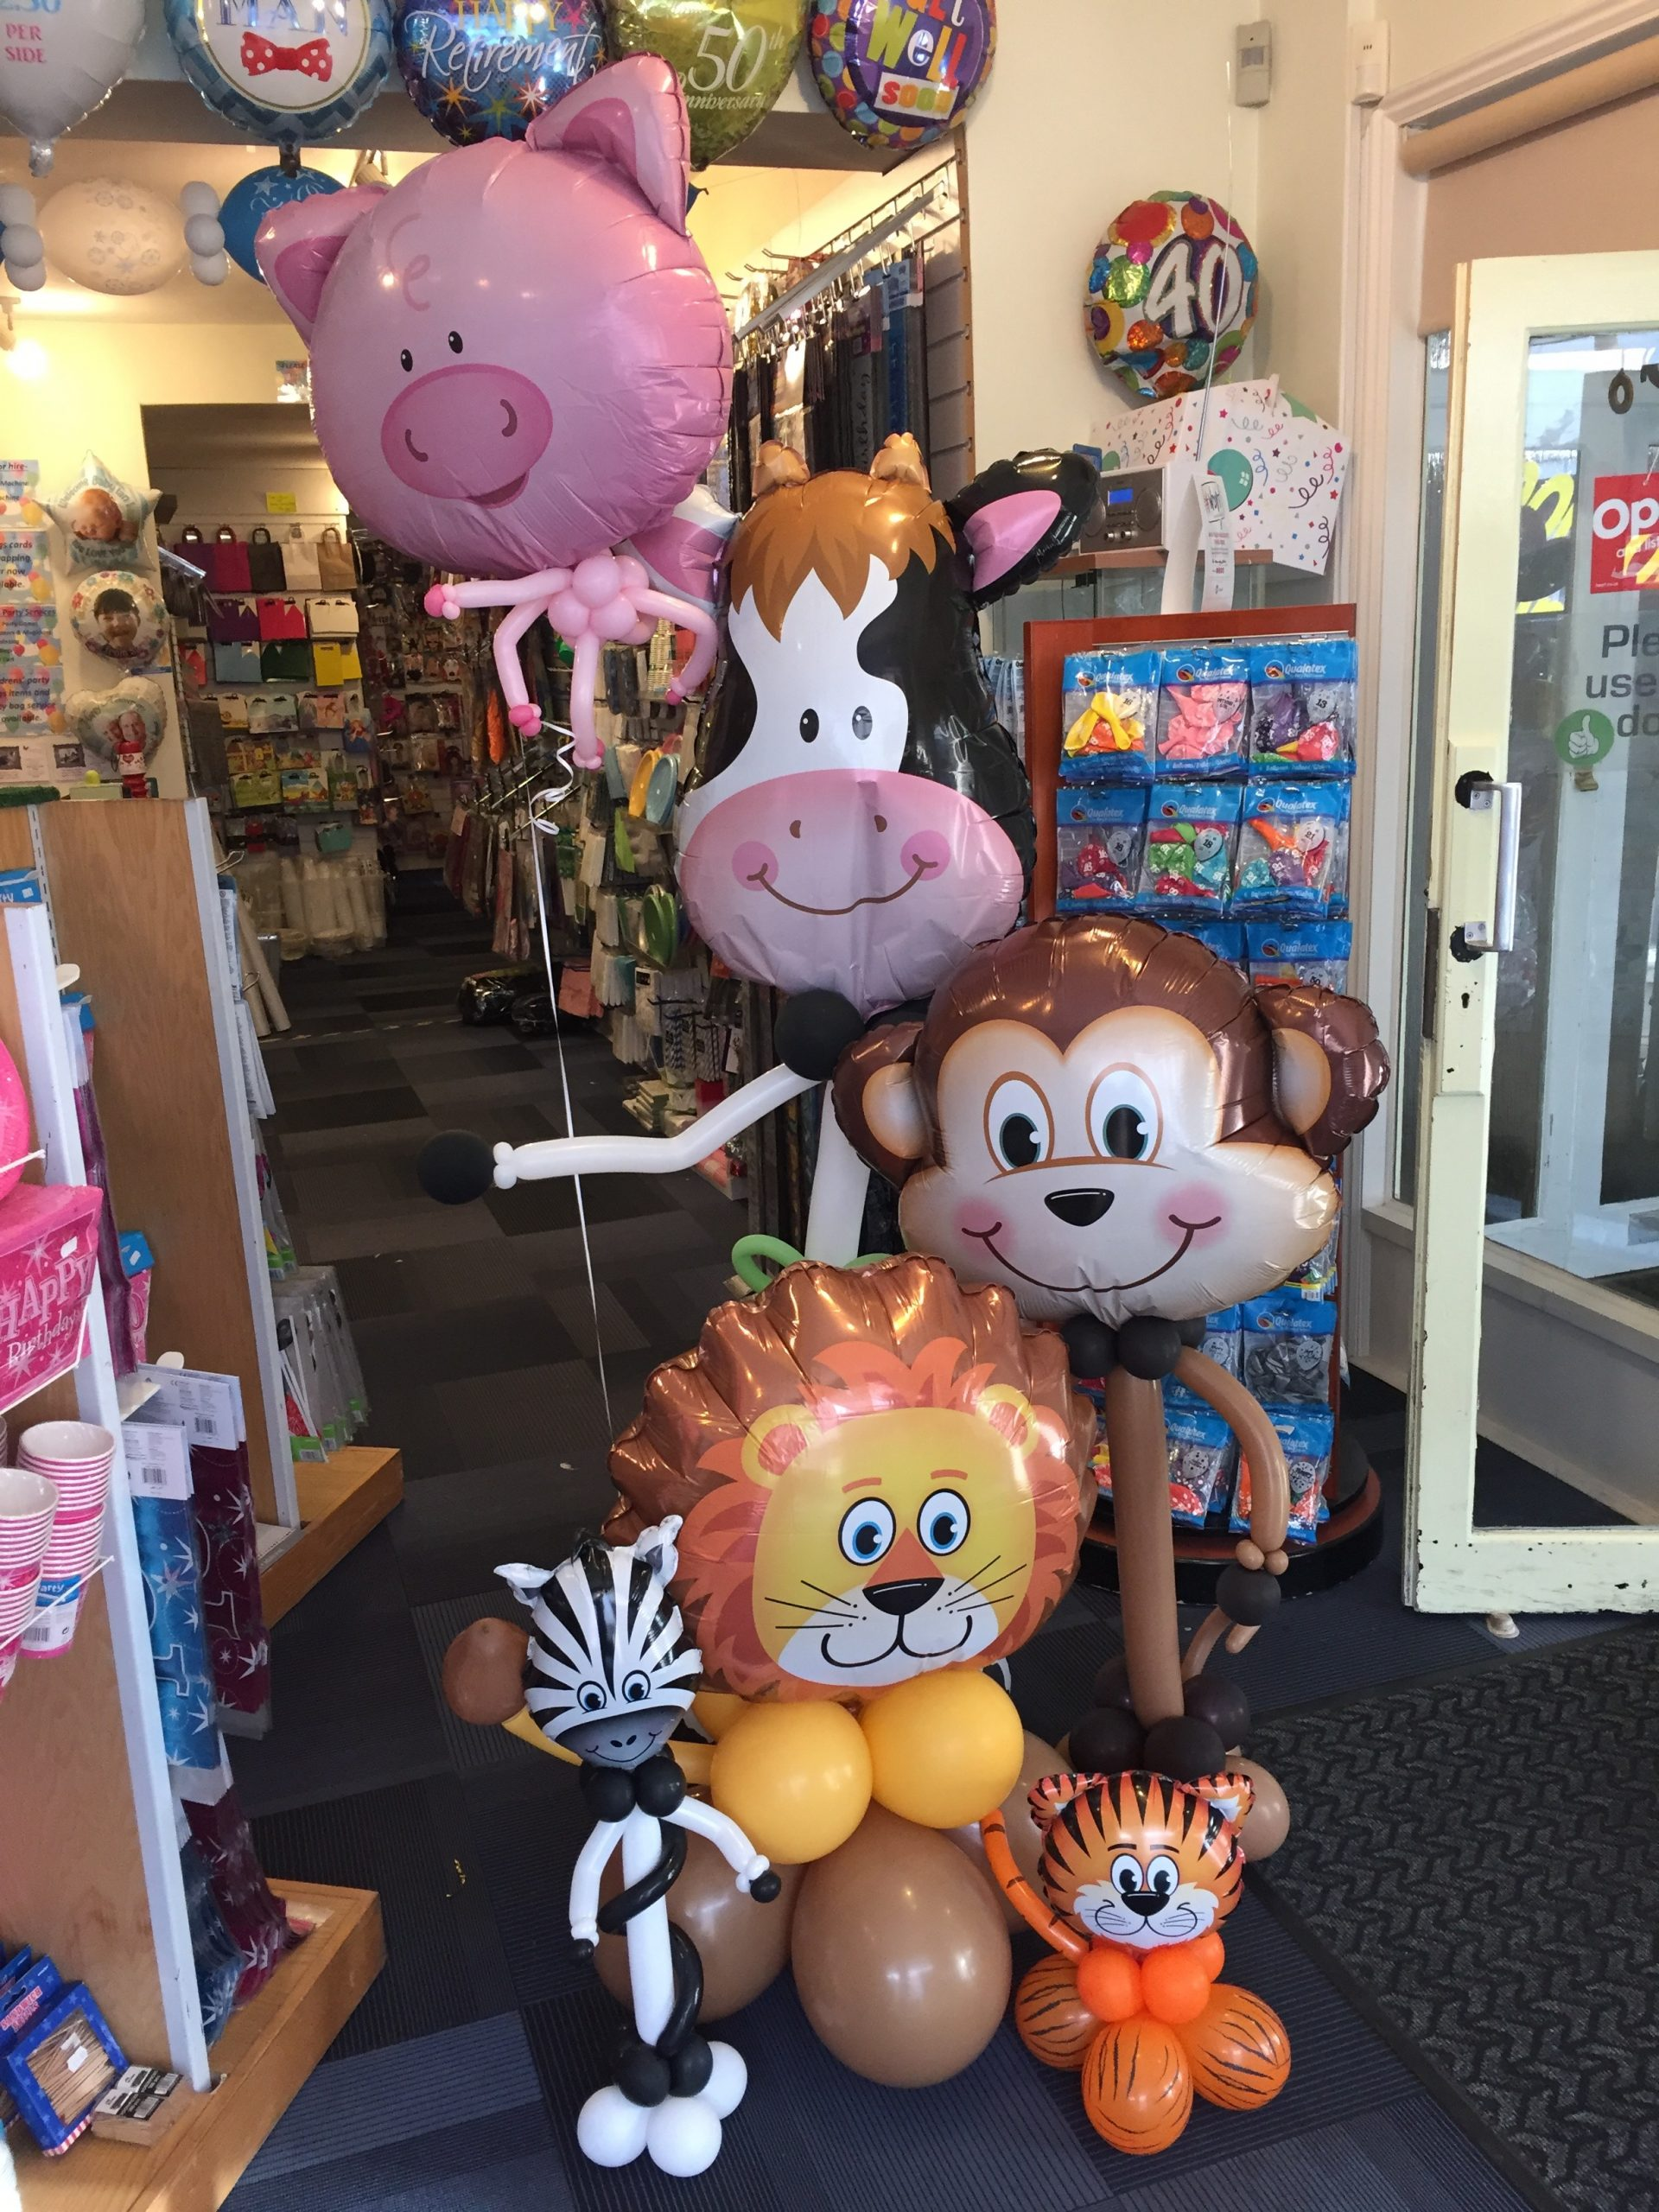 Selection of balloon animals